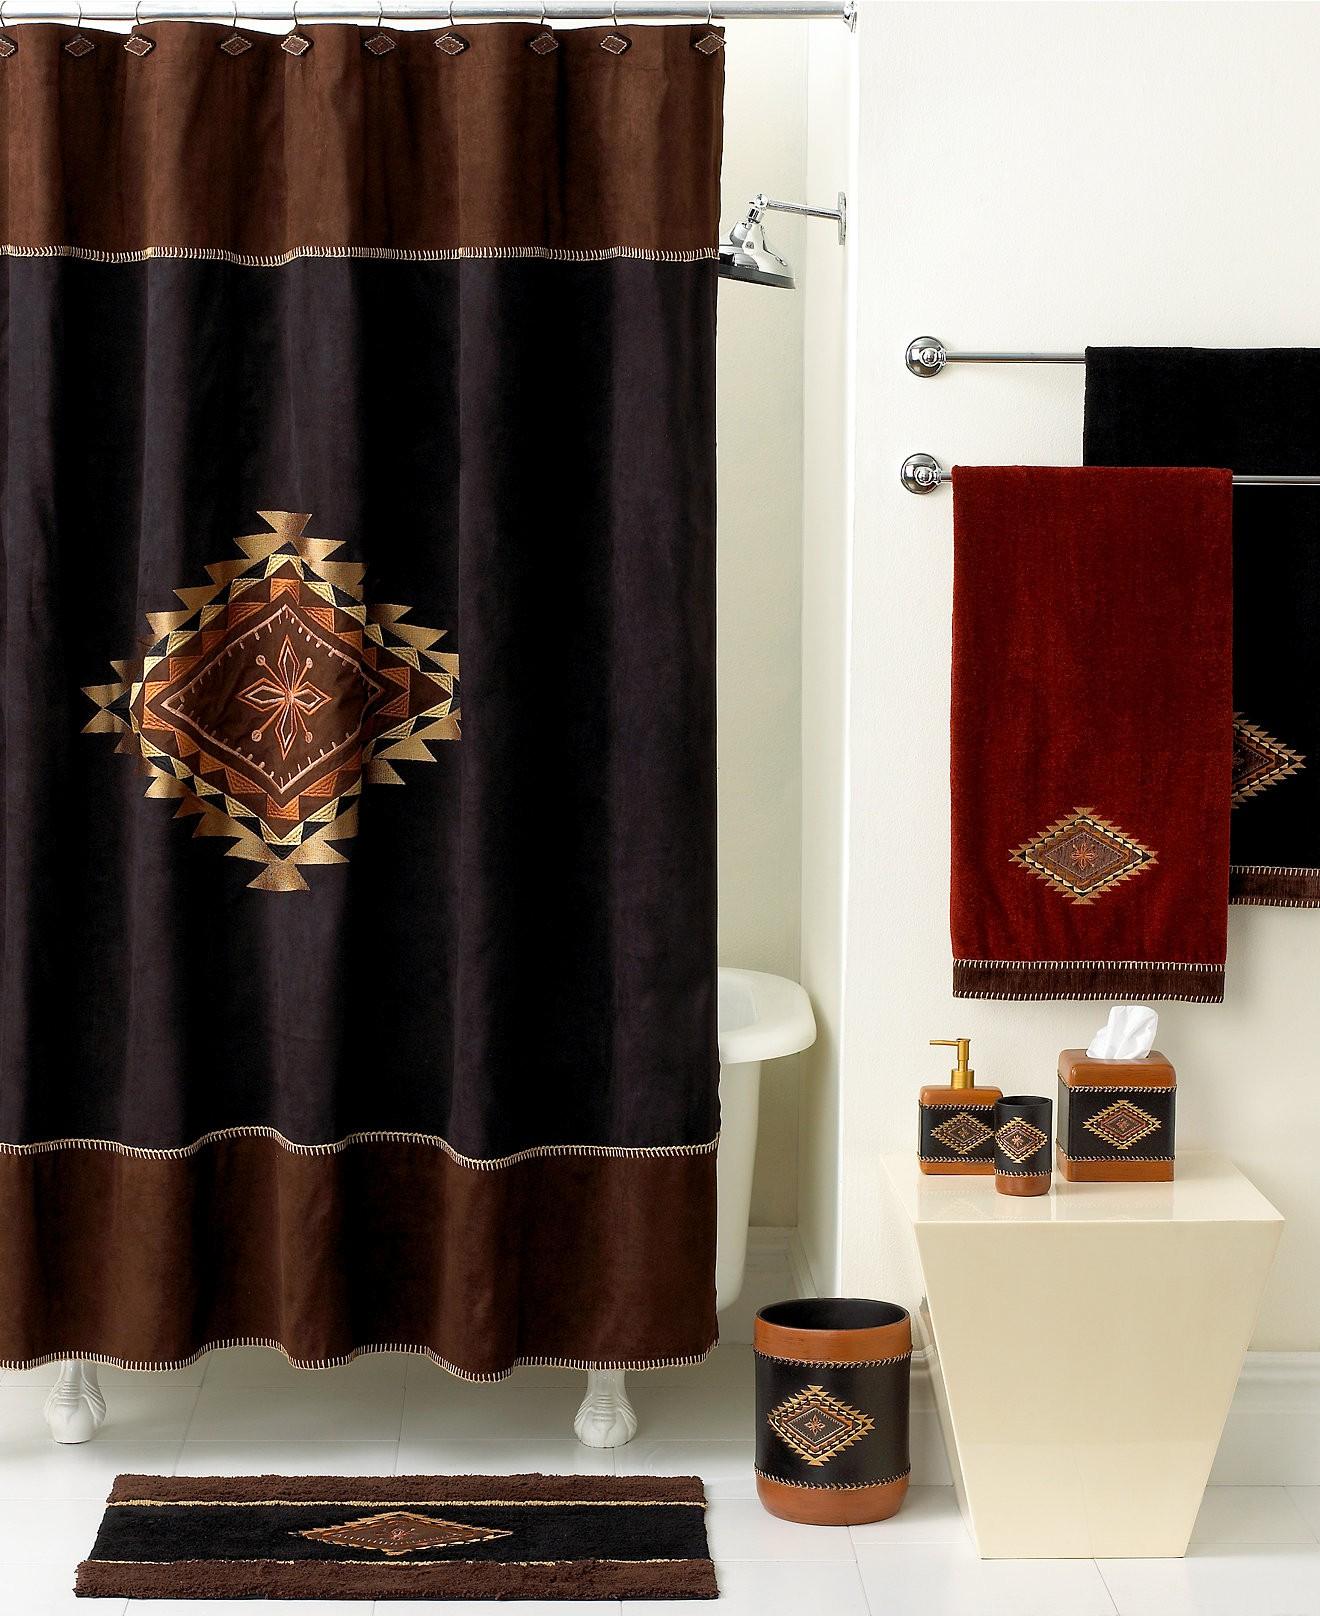 Avanti Bathroom Sets Terrific Bathrooms Design Bathroom Avanti Sets Throughout Size X Hearts Collection